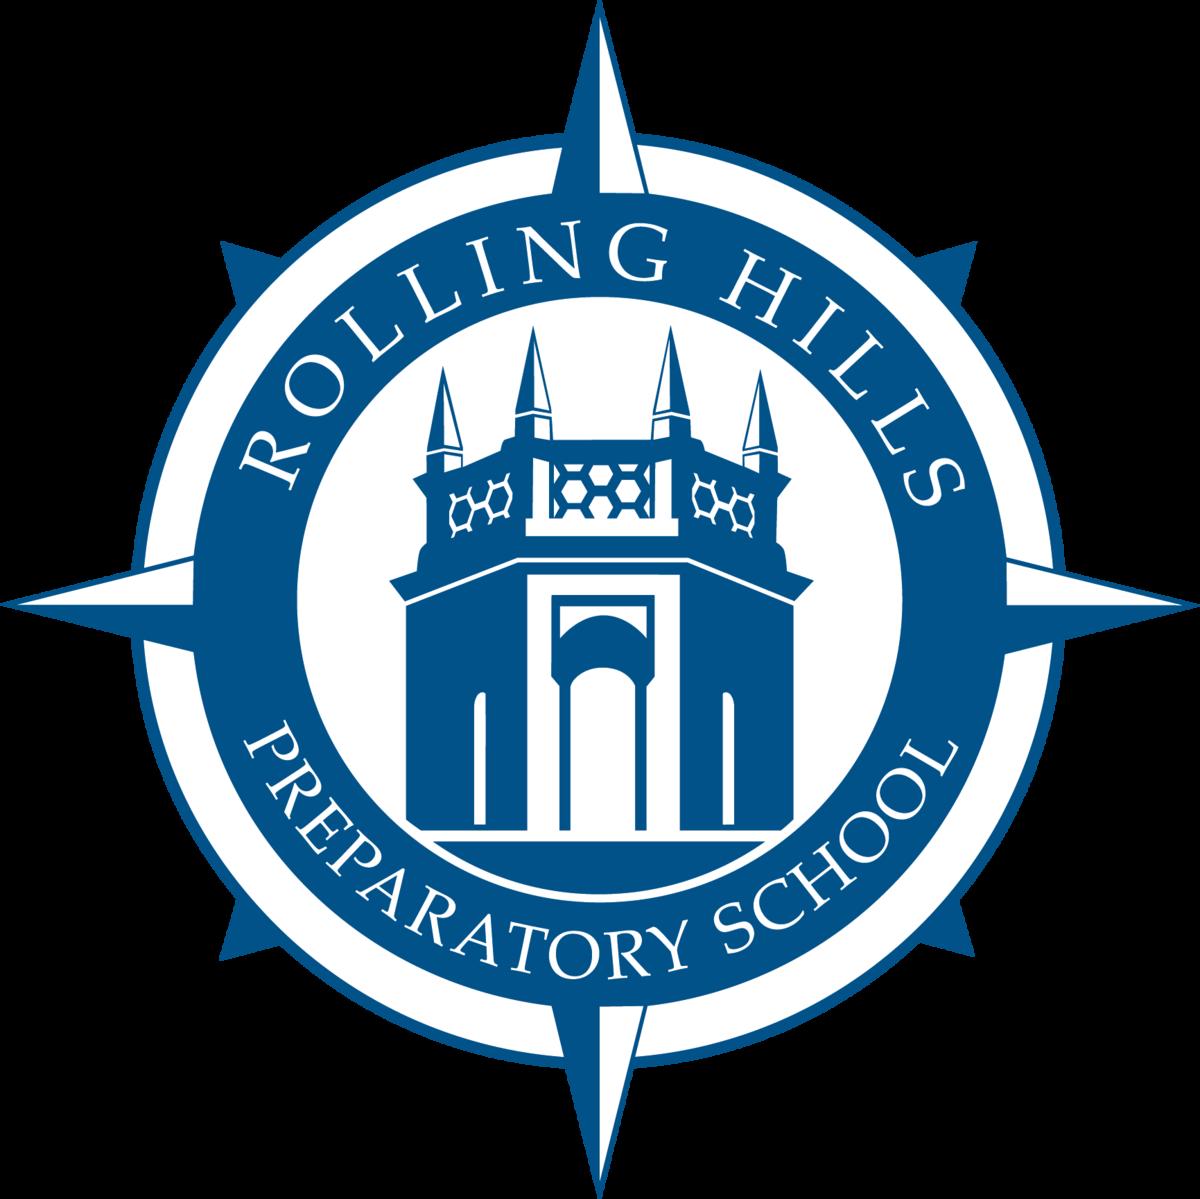 Rolling Hills Preparatory School Seal